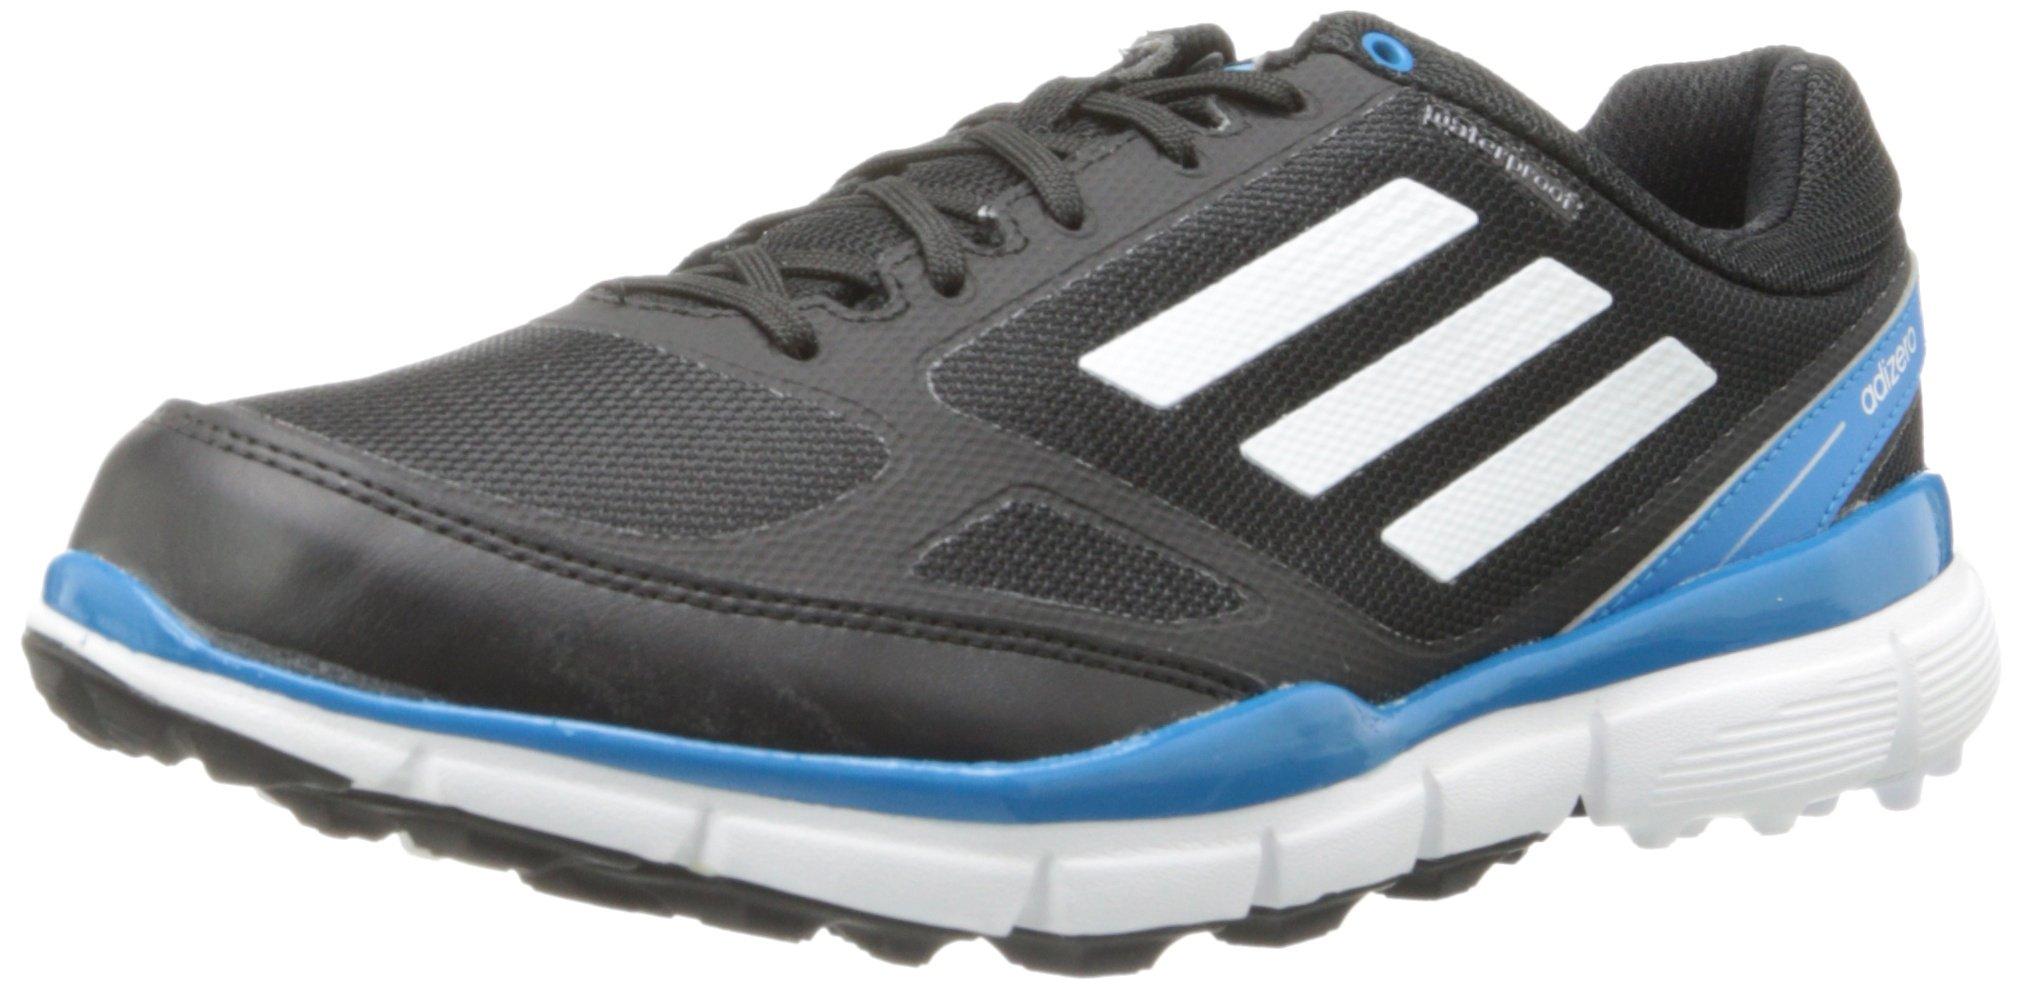 adidas Women's Adizero Sport II Golf Shoe,Black/White/Solar Blue,10 M US